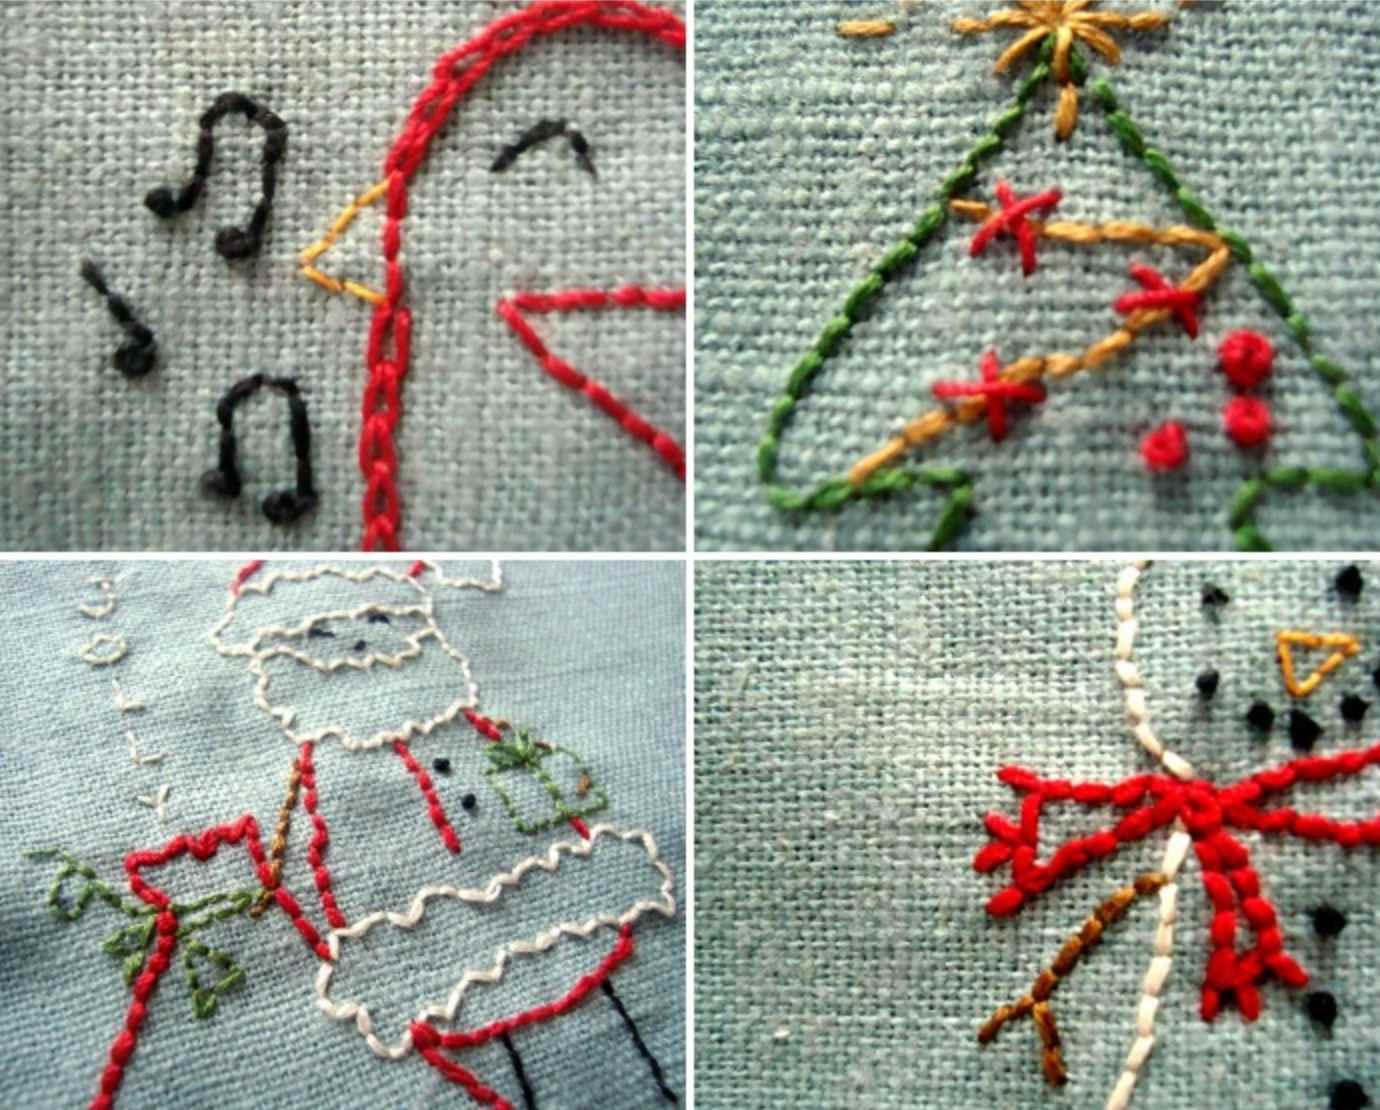 Bird, Tree, Santa, and Snowman Christmas embroidery on grayish blue fabric.